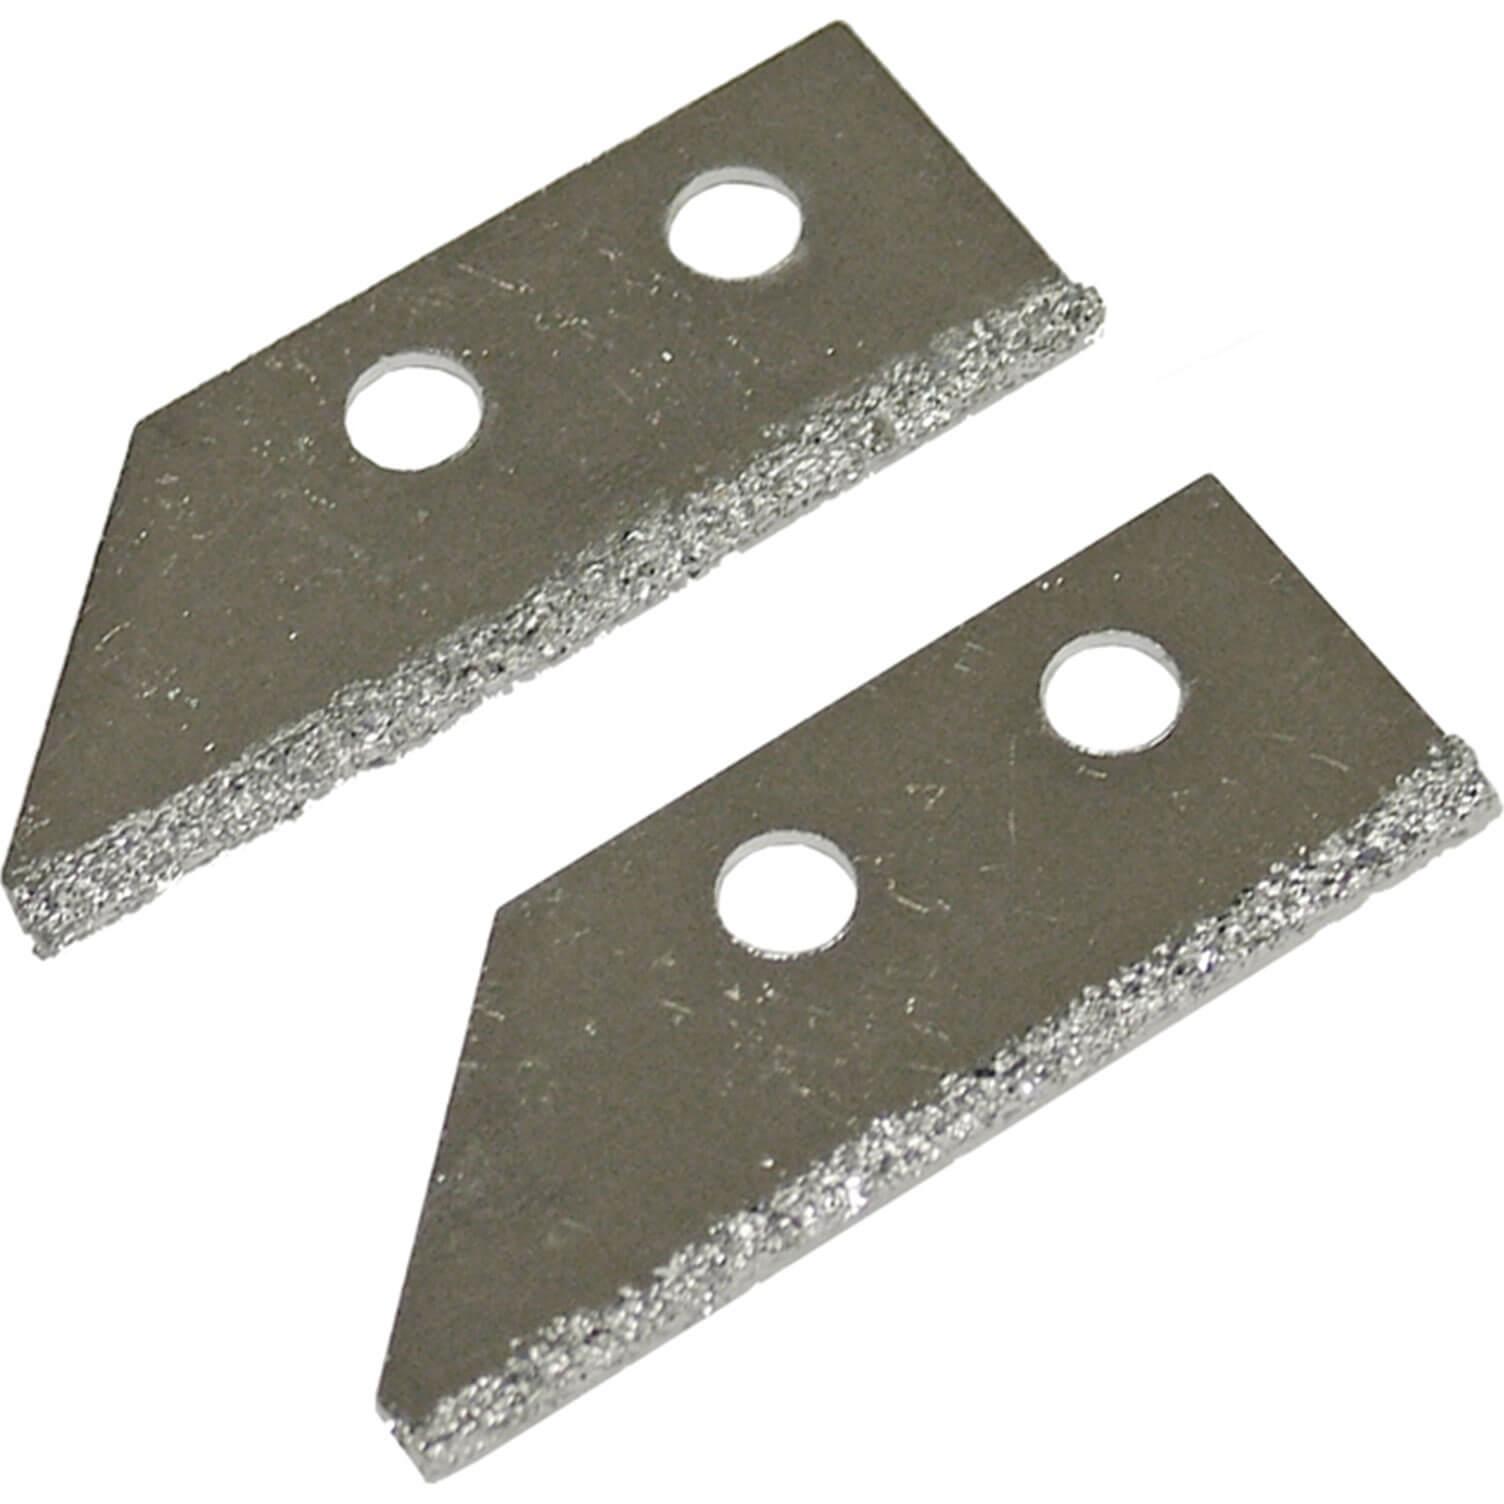 Image of Faithfull Carbide Tile Grout Rake Blades